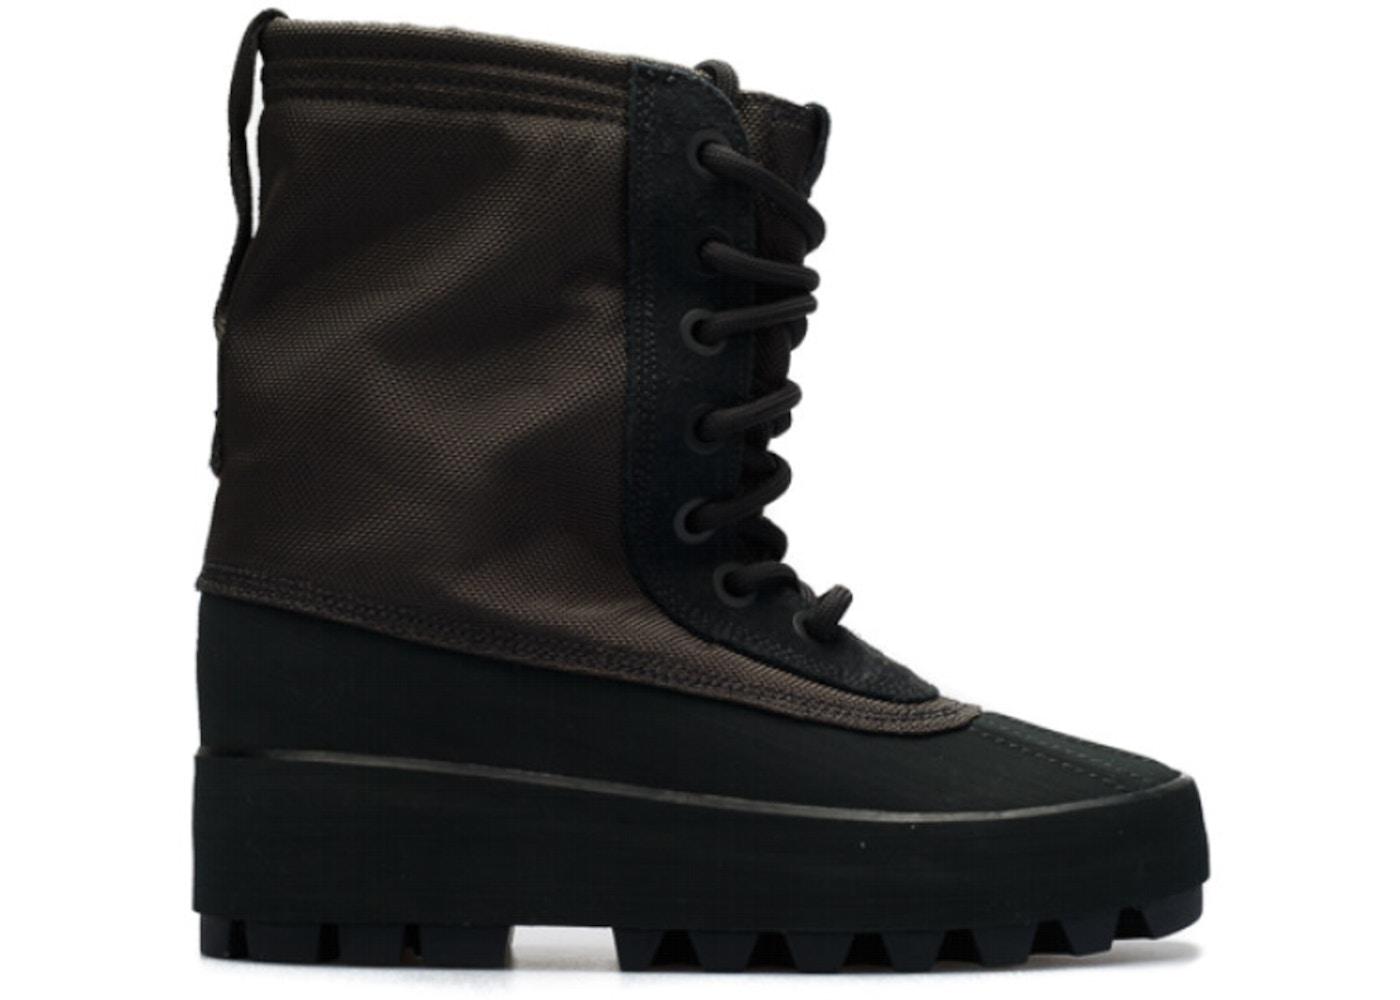 dc008573bd6 adidas Yeezy Boost 950 Pirate Black (W) - AQ4837